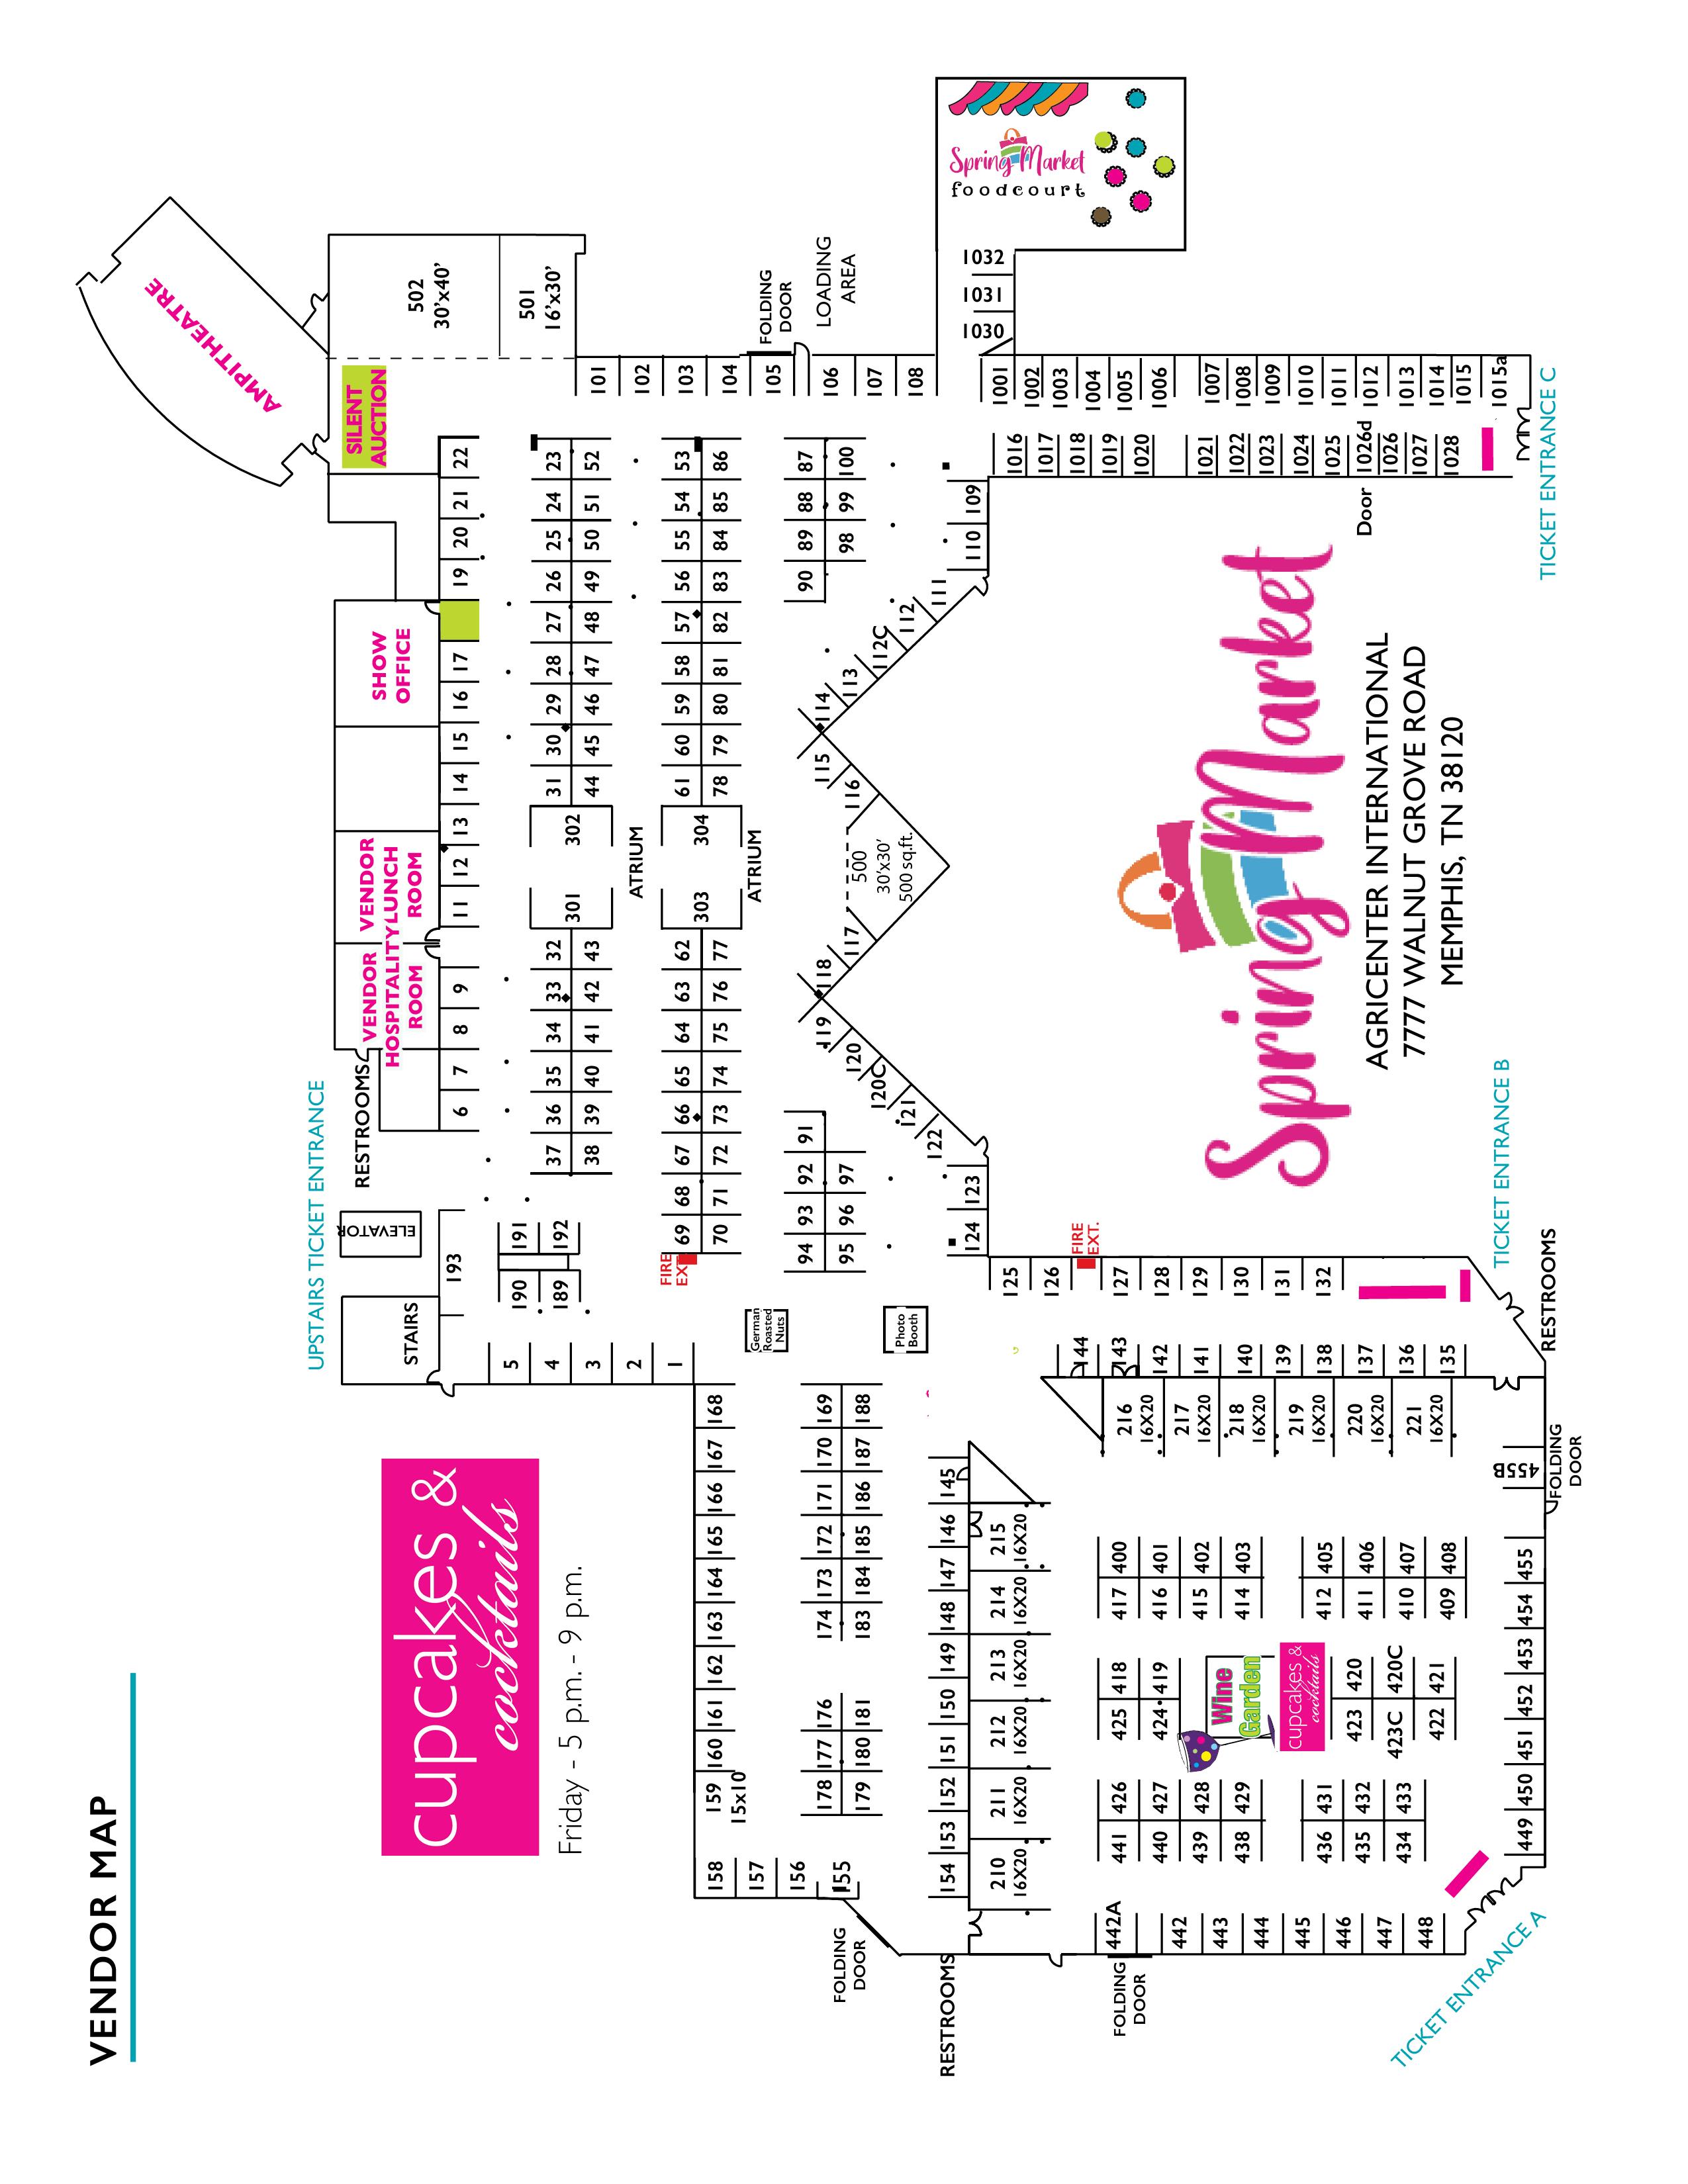 Jackson show map